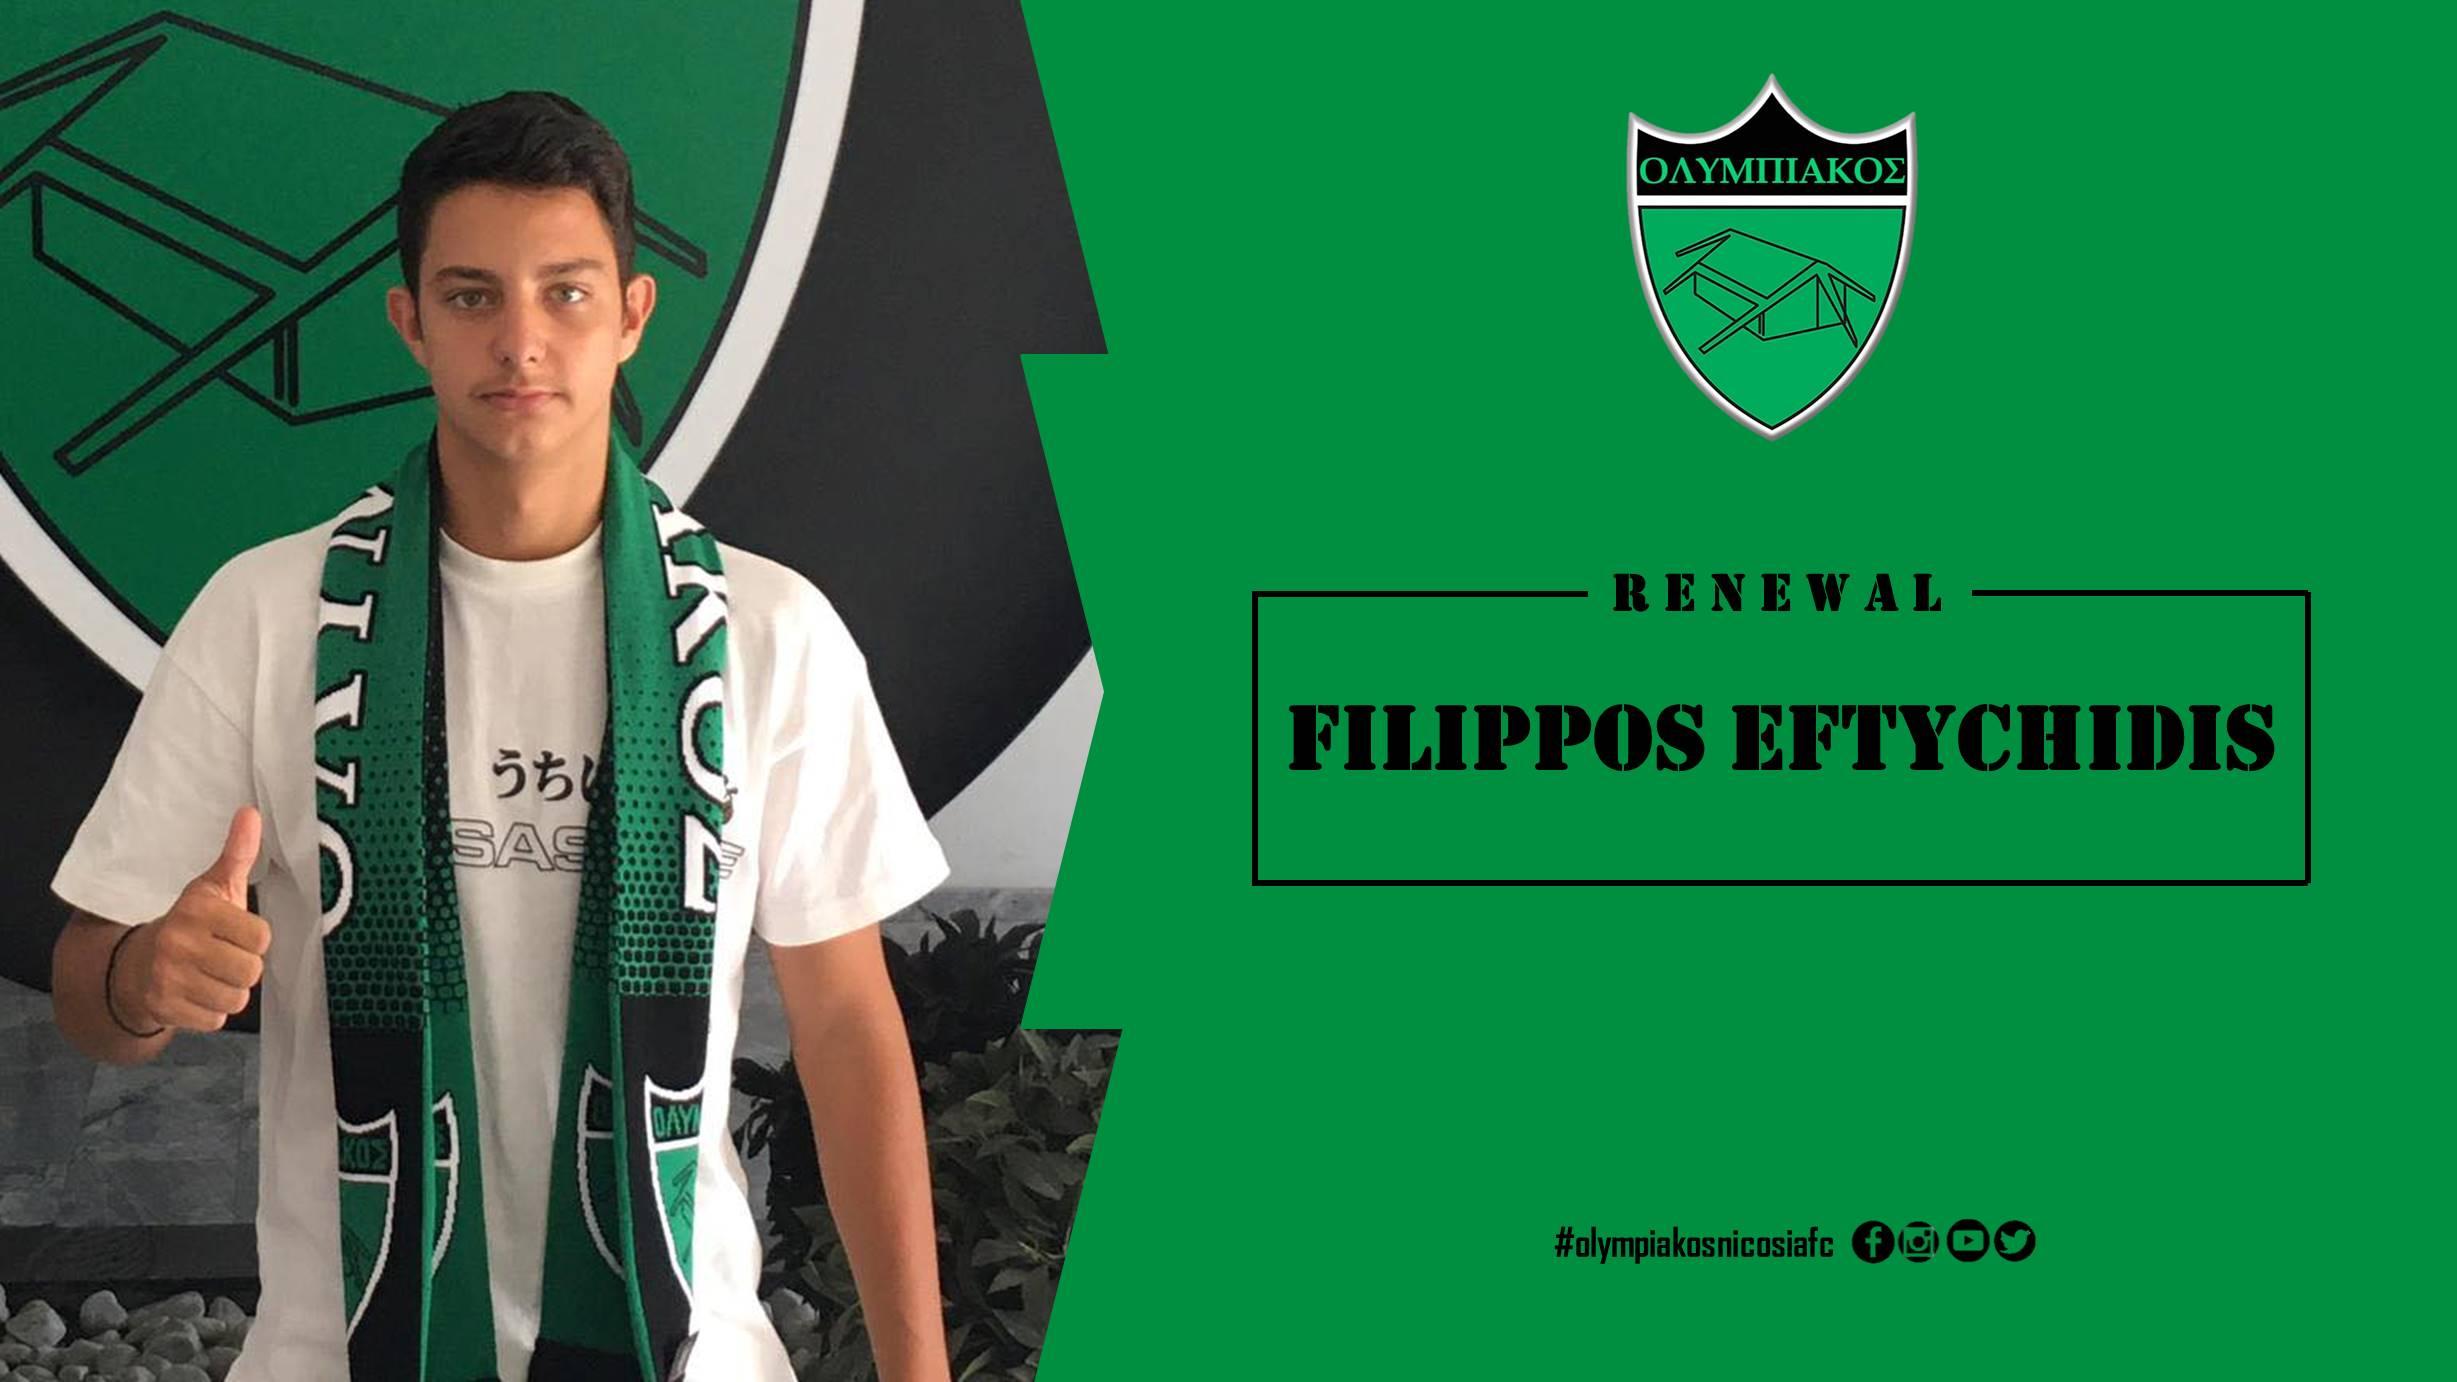 filippos eftychidis website